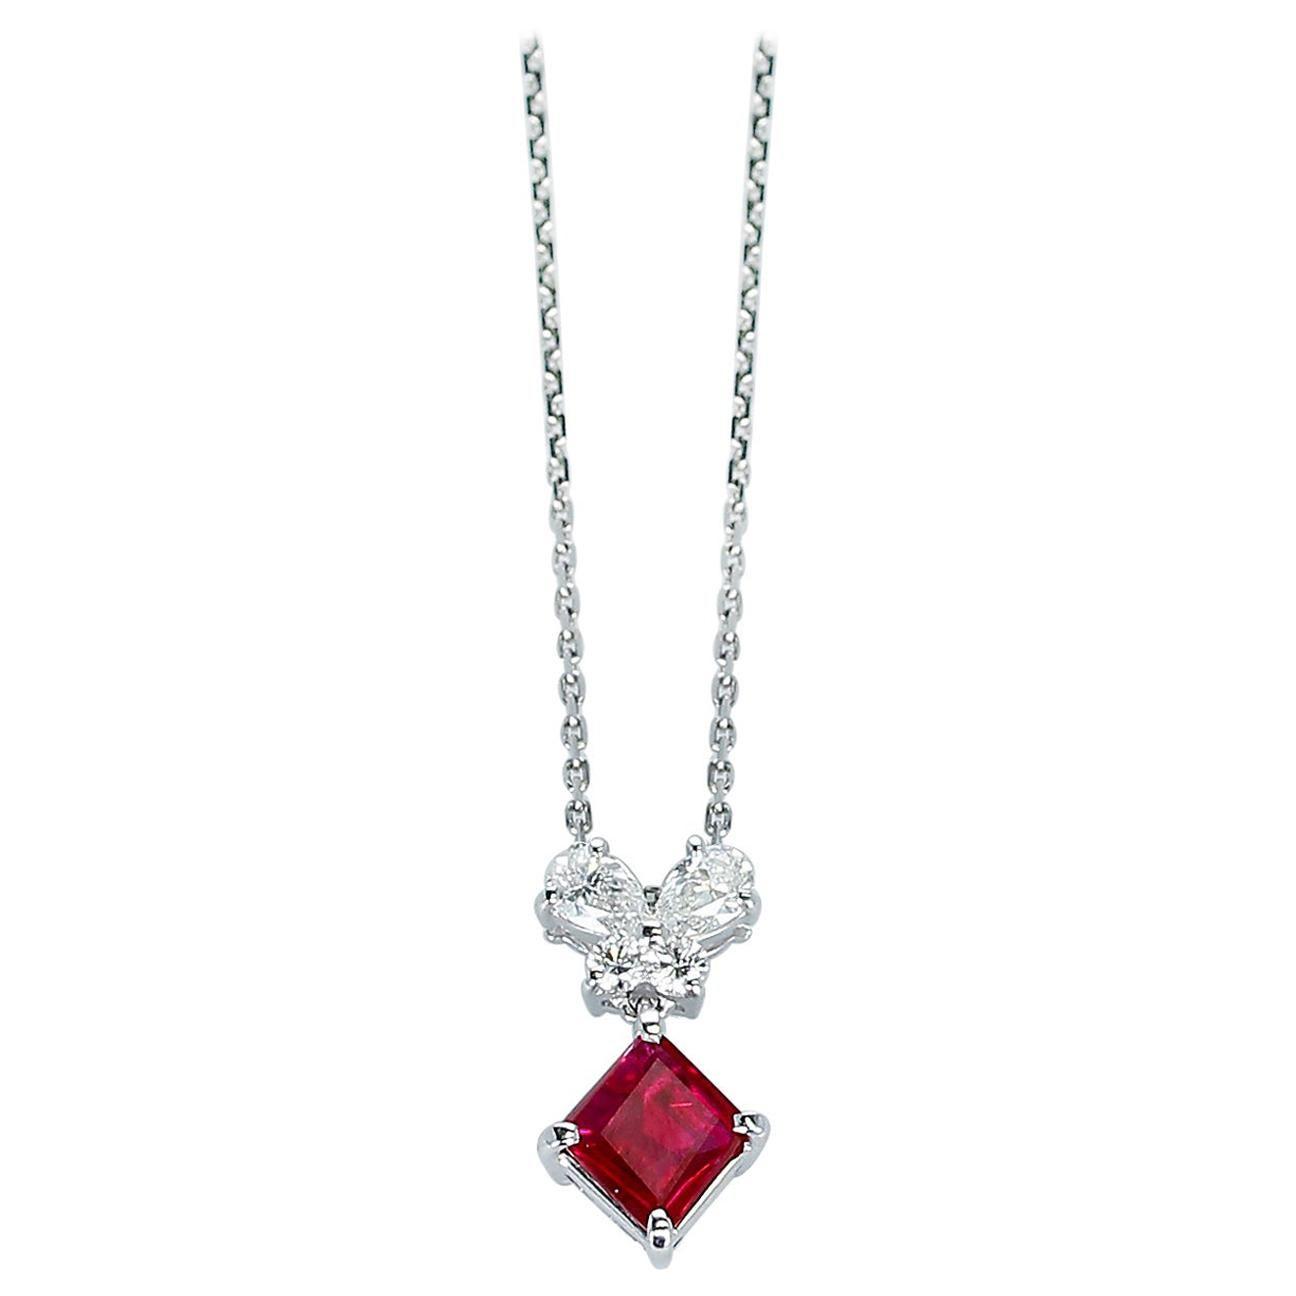 0.94 Ct. Ruby and 0.32 Ct. Diamonds Pendant Necklace, Platinum